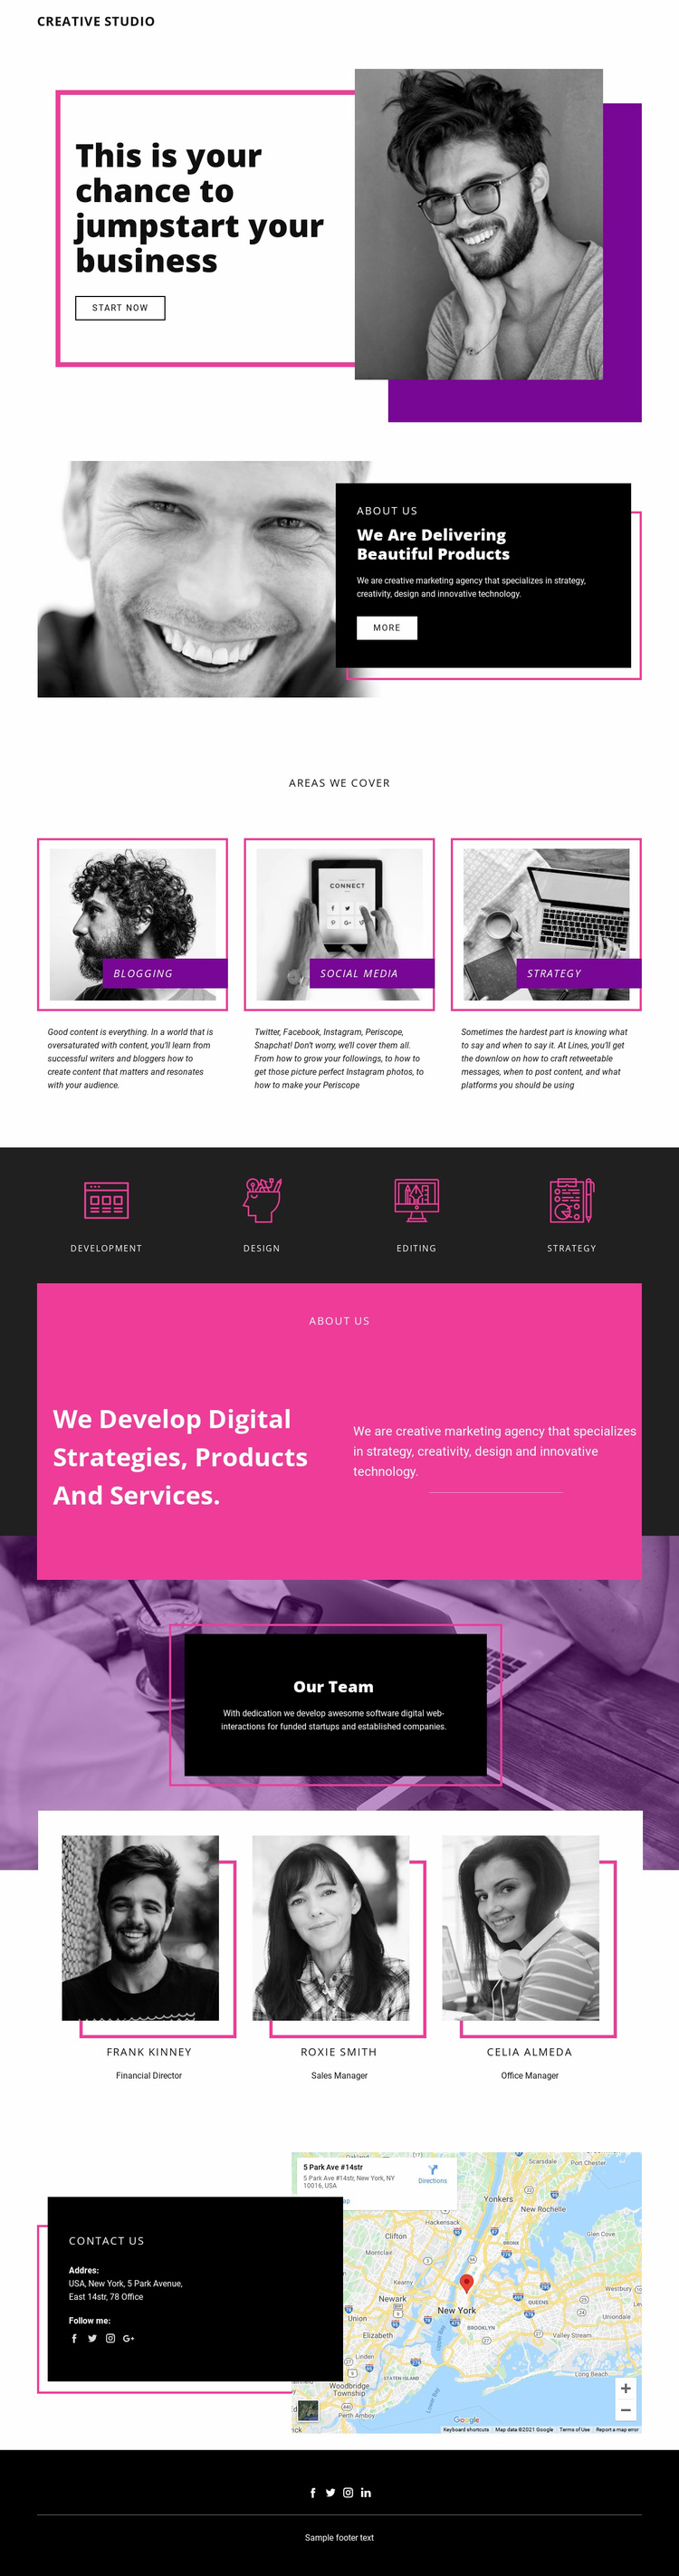 Digital Studio Website Design